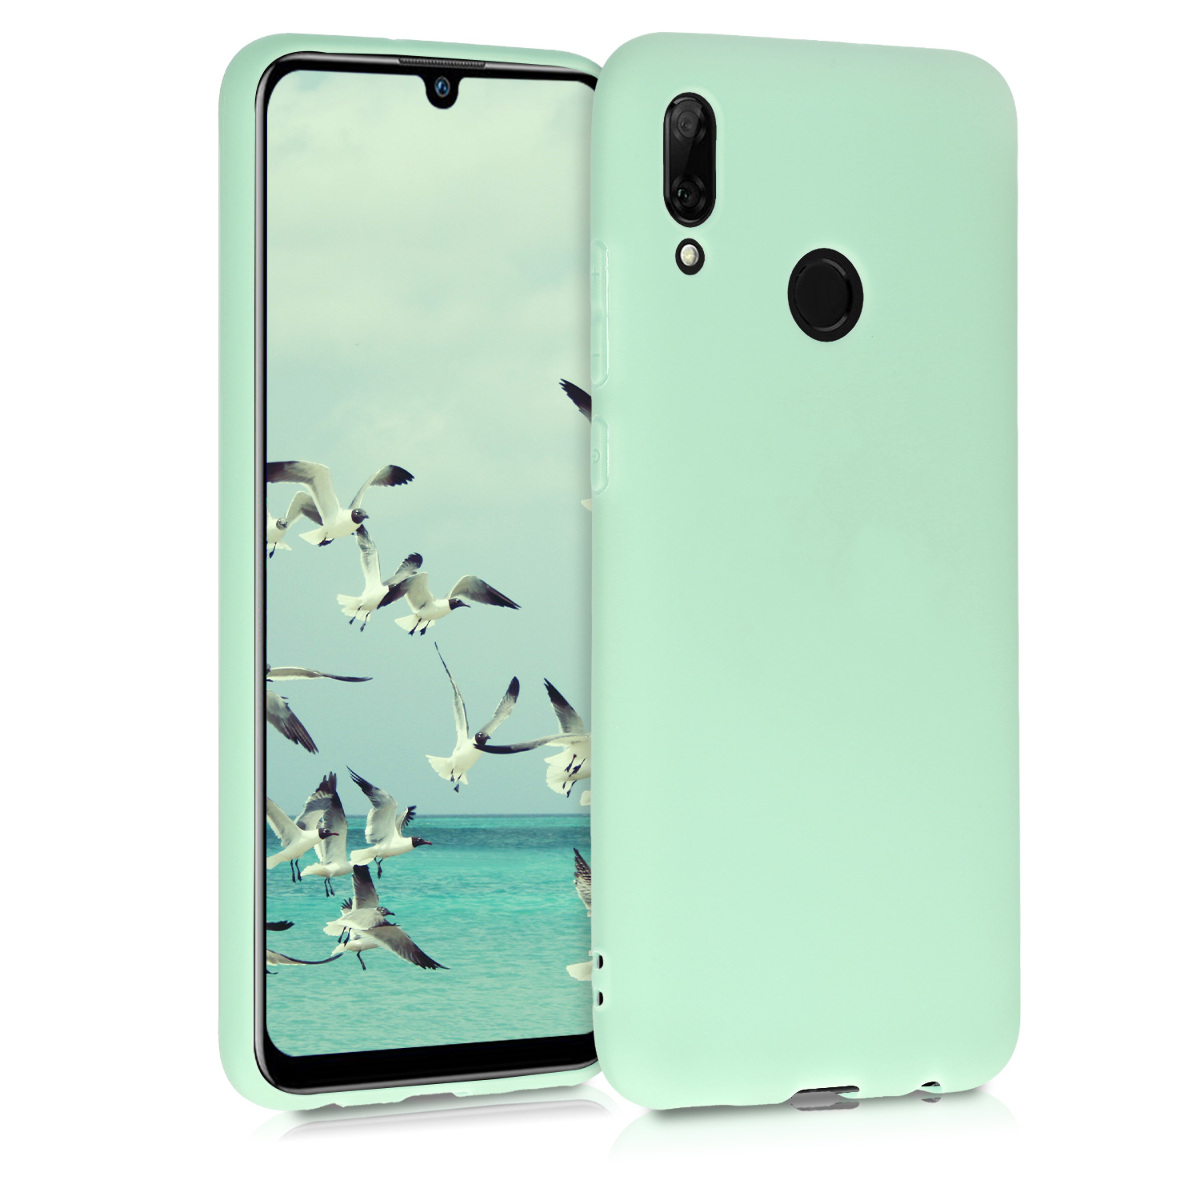 KW Θήκη Σιλικόνης Huawei P Smart 2019 - Mint Matte (47386.50)